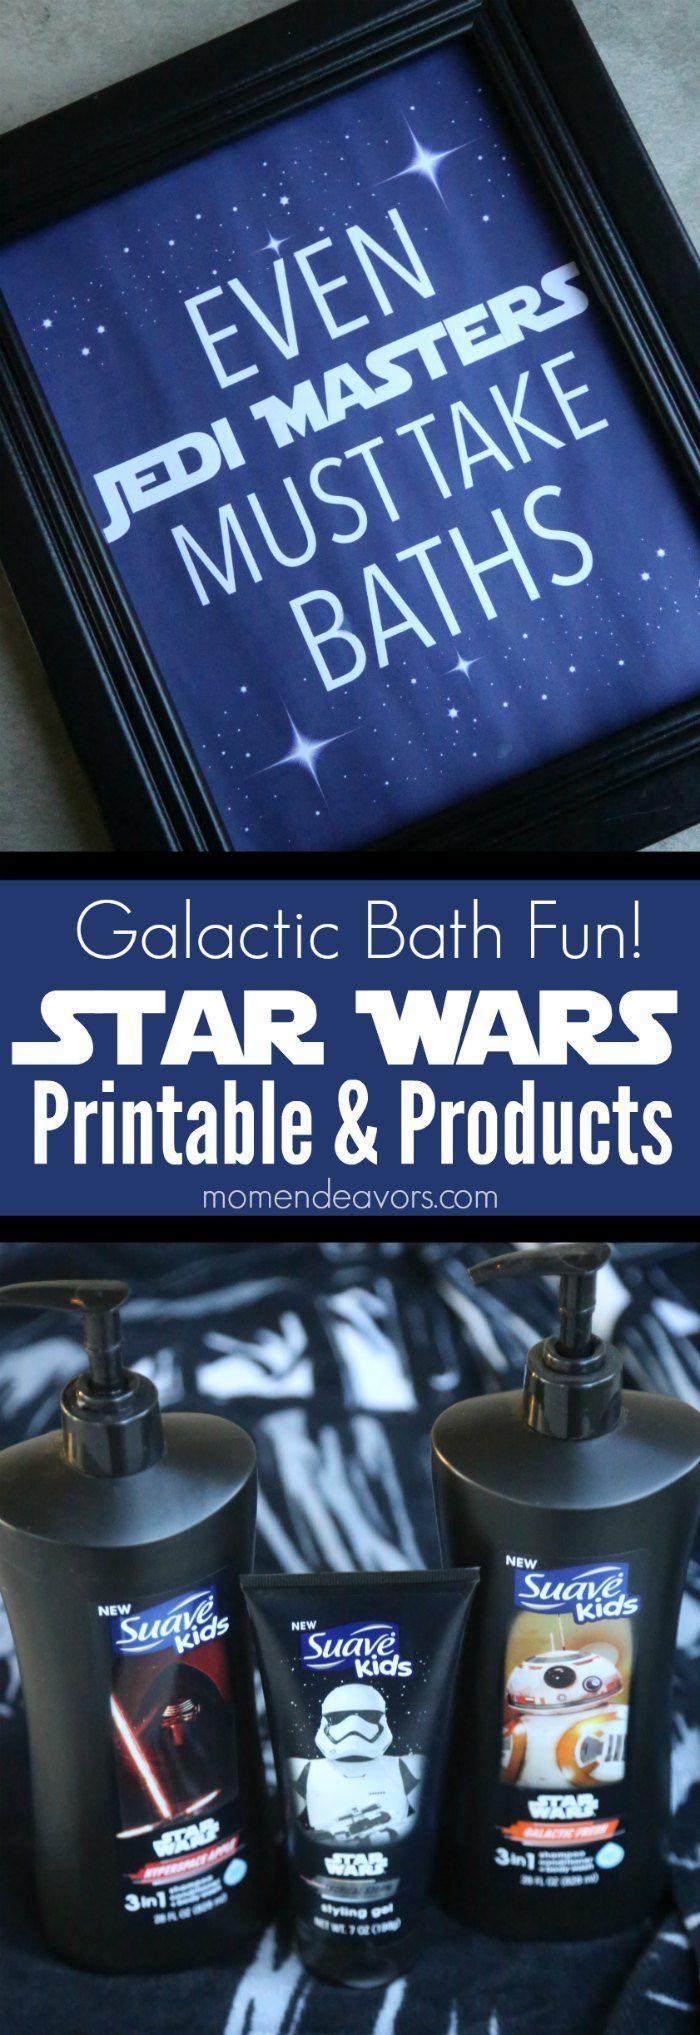 Star Wars Bath Time Fun for Kids - Star Wars bath products and free Star Wars-inspired bath printable.